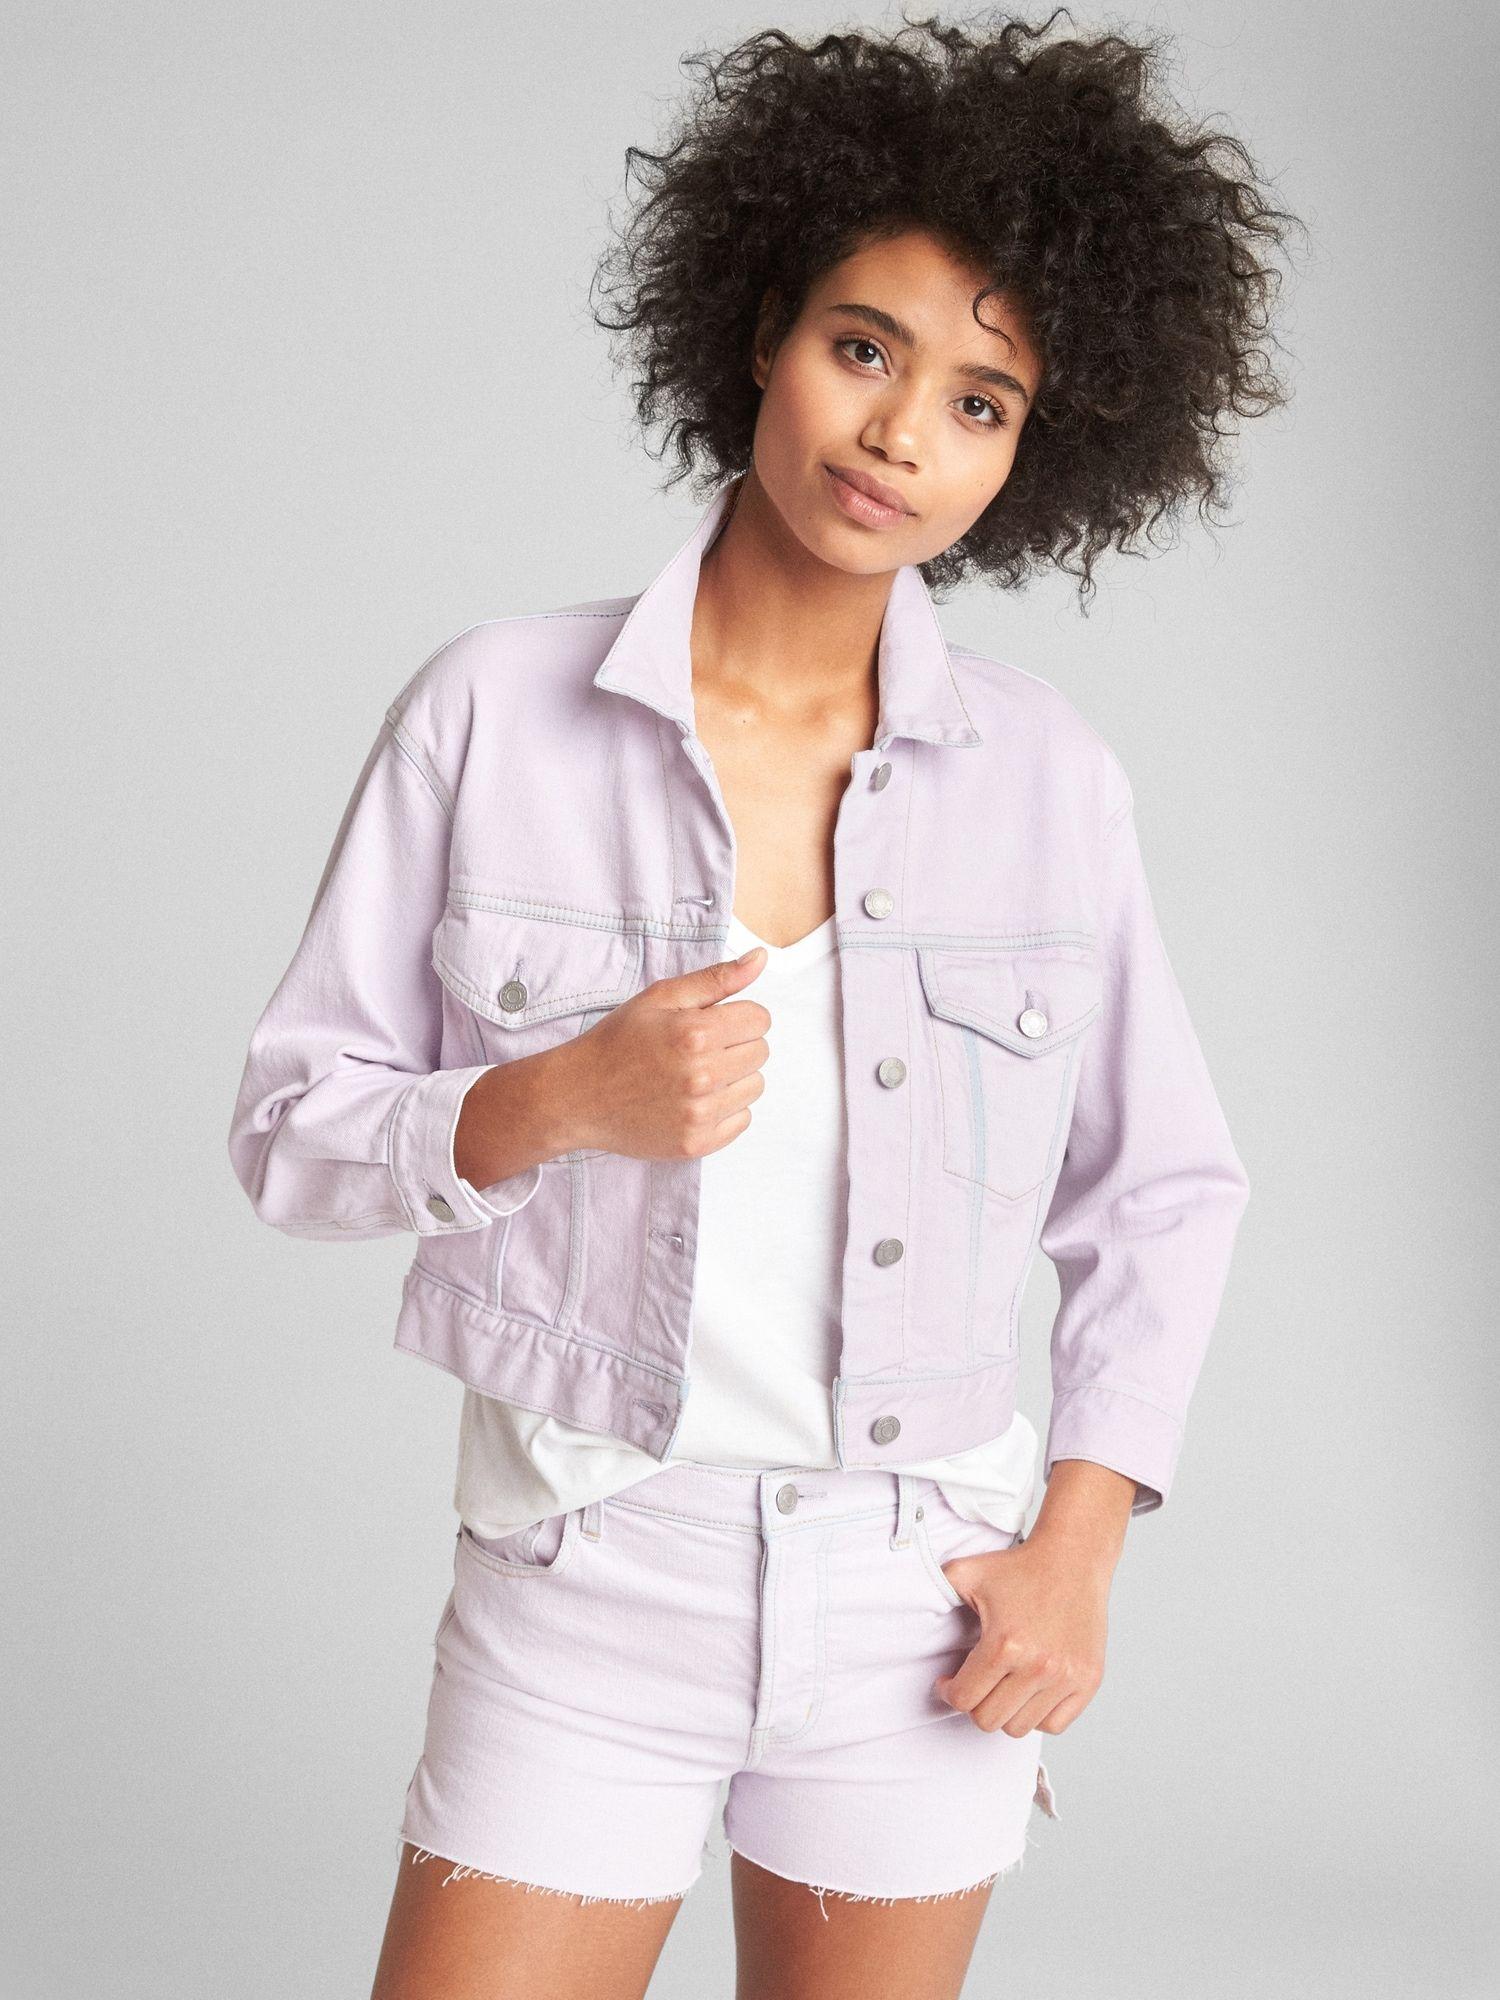 Lavender Jean Jacket Affordable Trendy Clothes Lavender Jeans Black Friday Shopping [ 2000 x 1500 Pixel ]